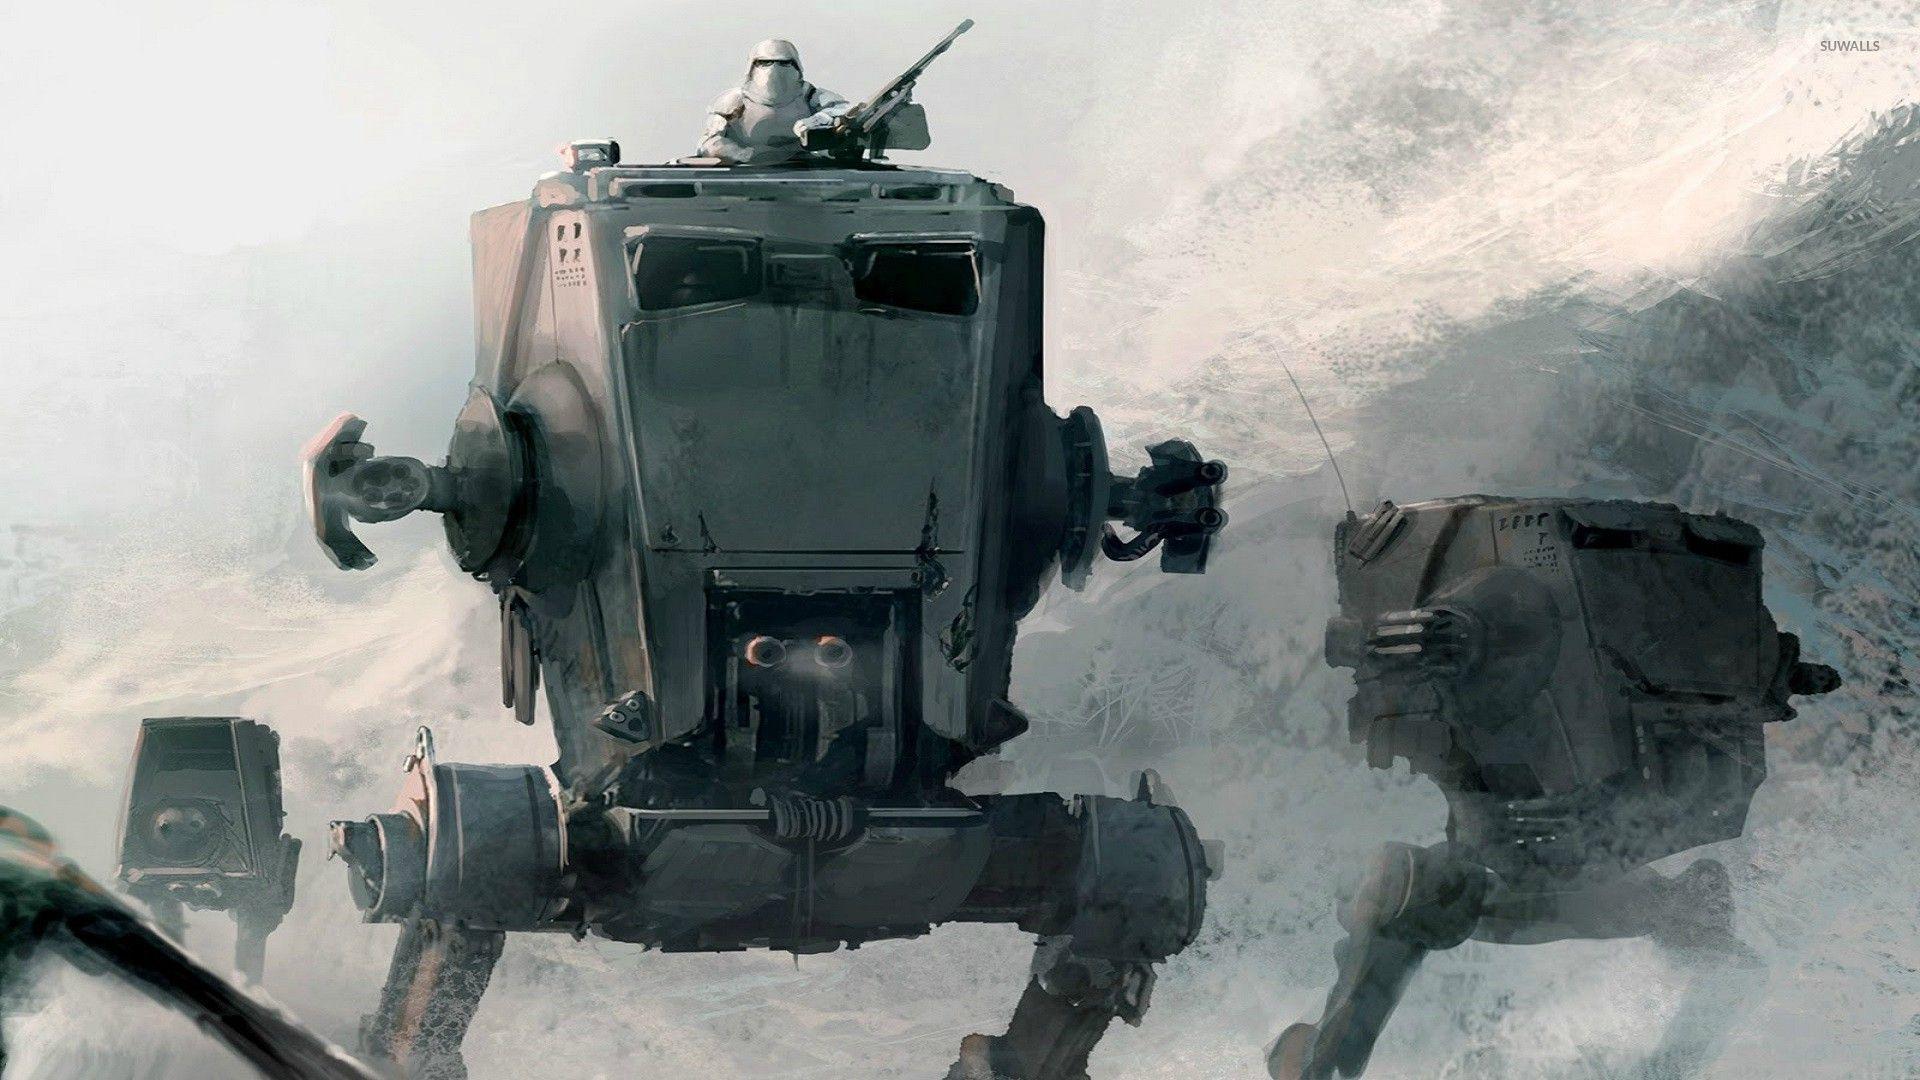 Star Wars Battlefield 4 crossover wallpaper - Game